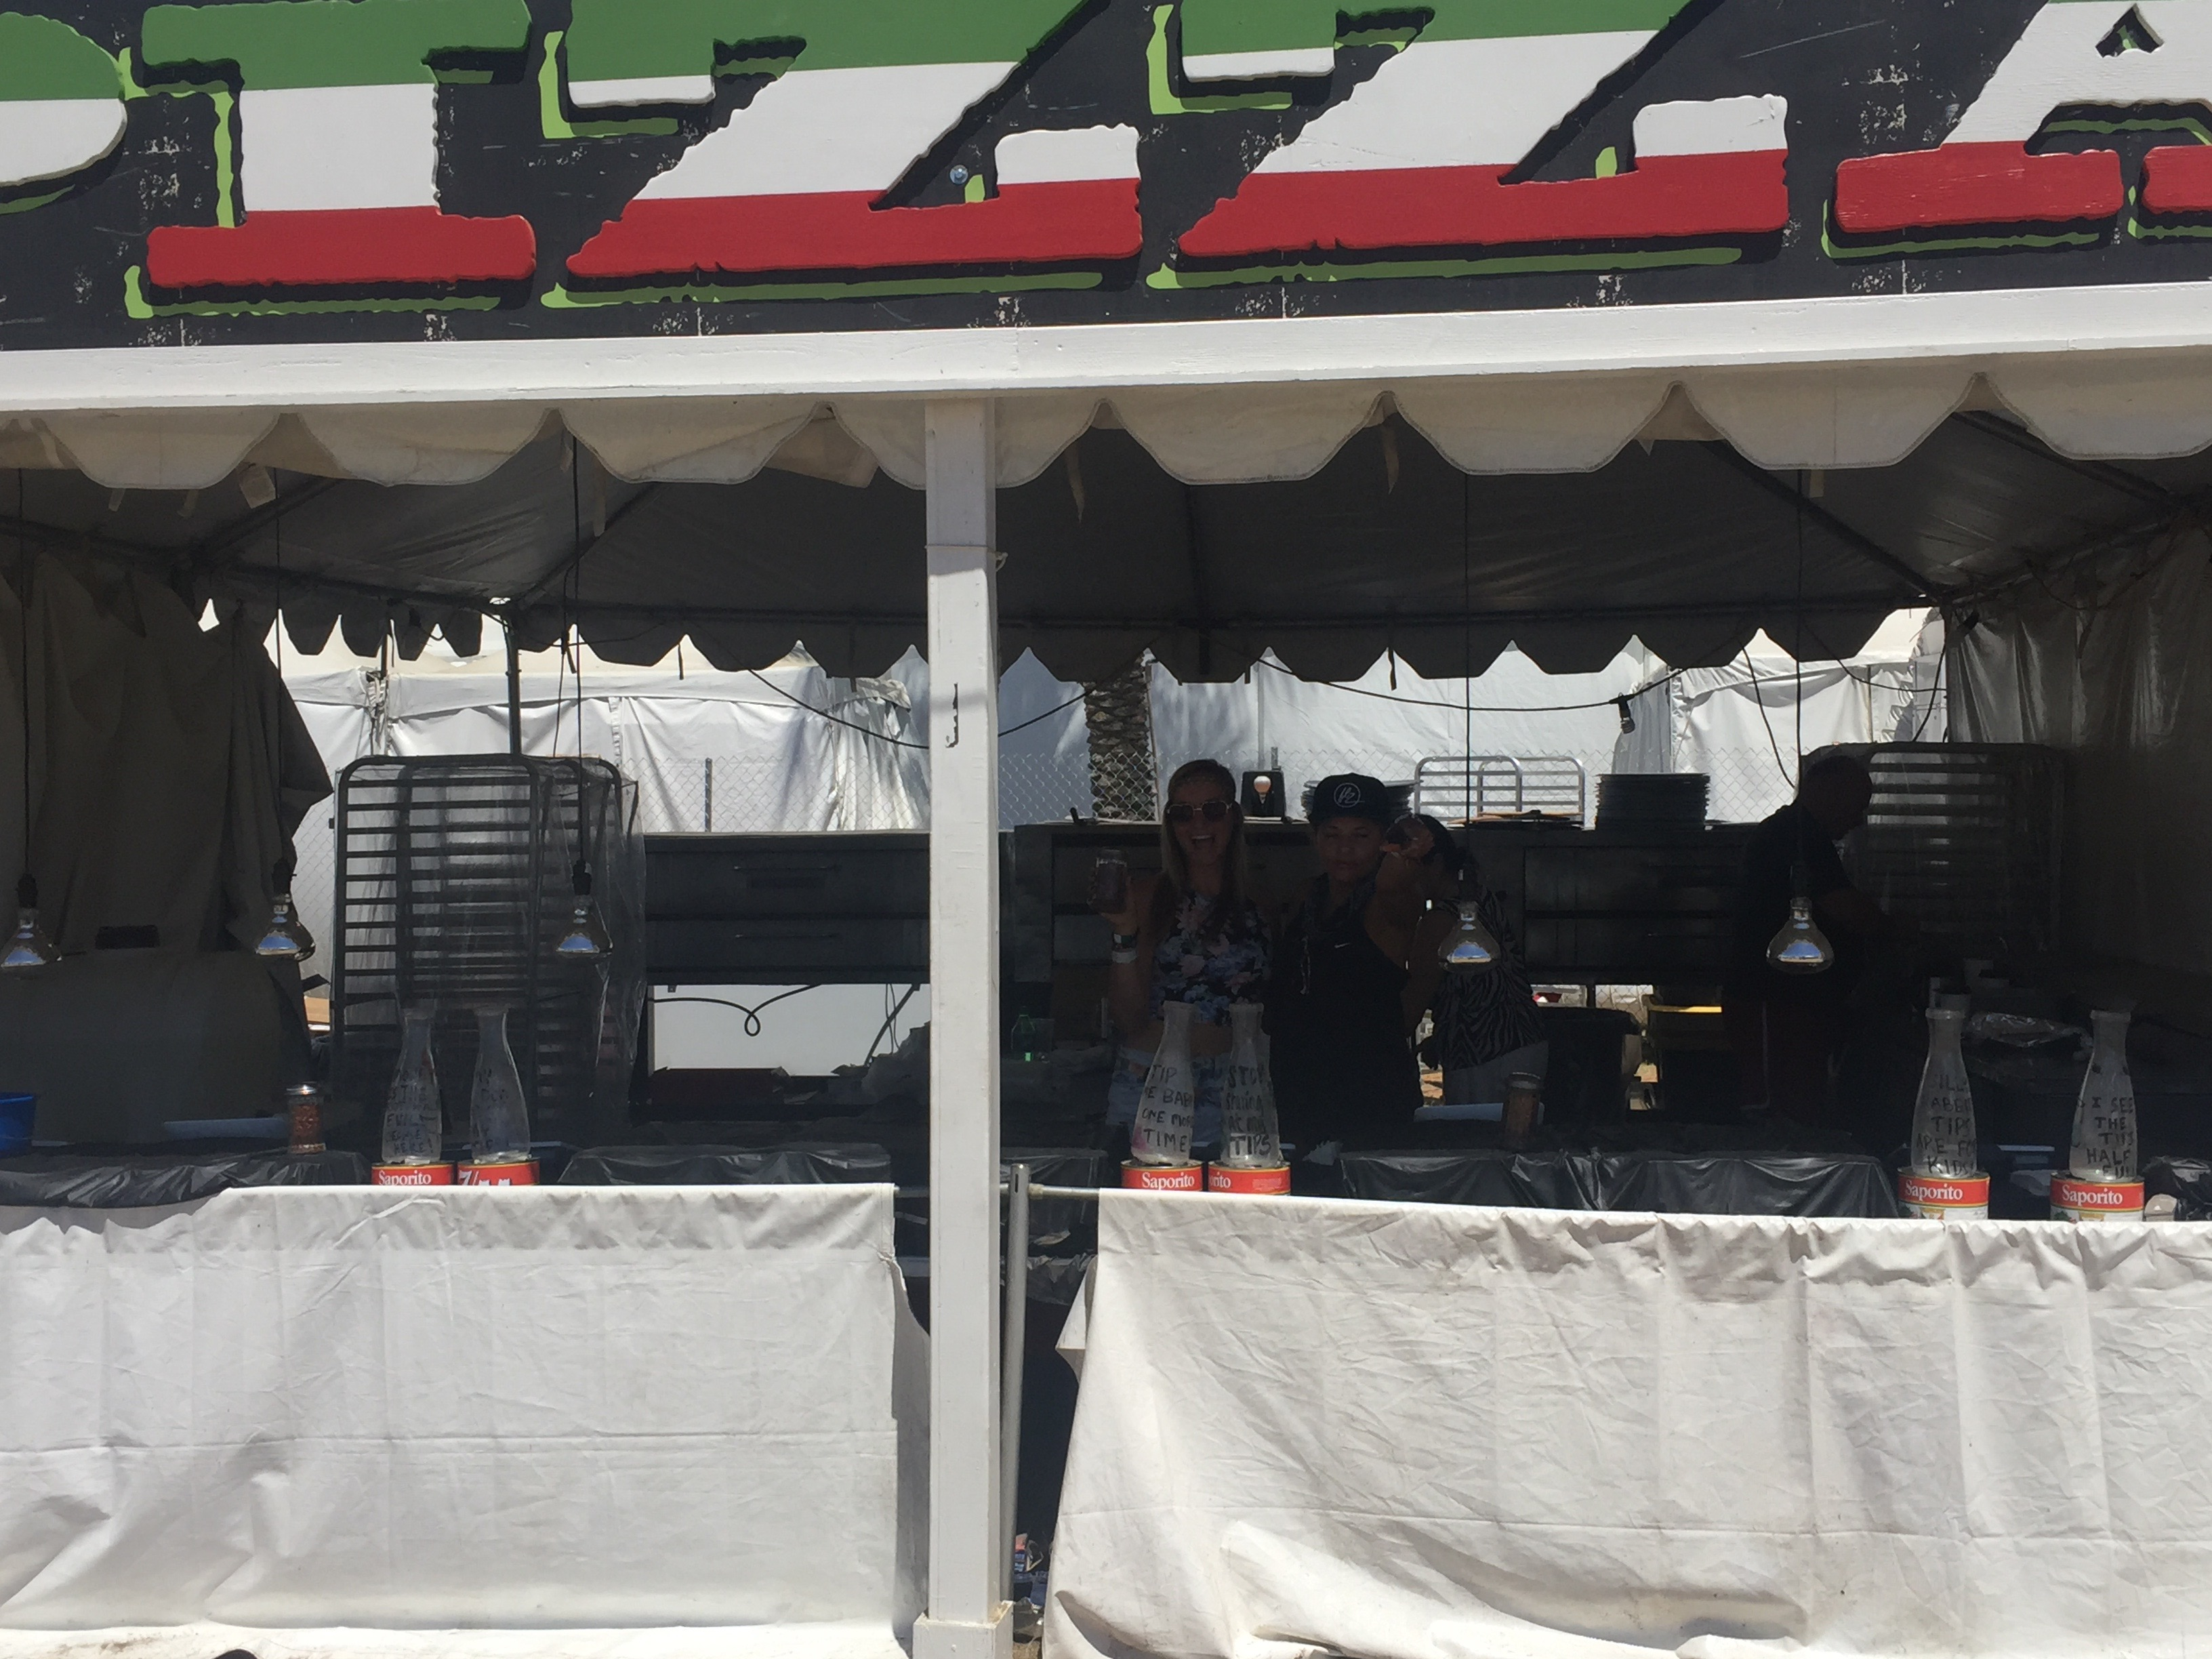 Coachella 2016 booth